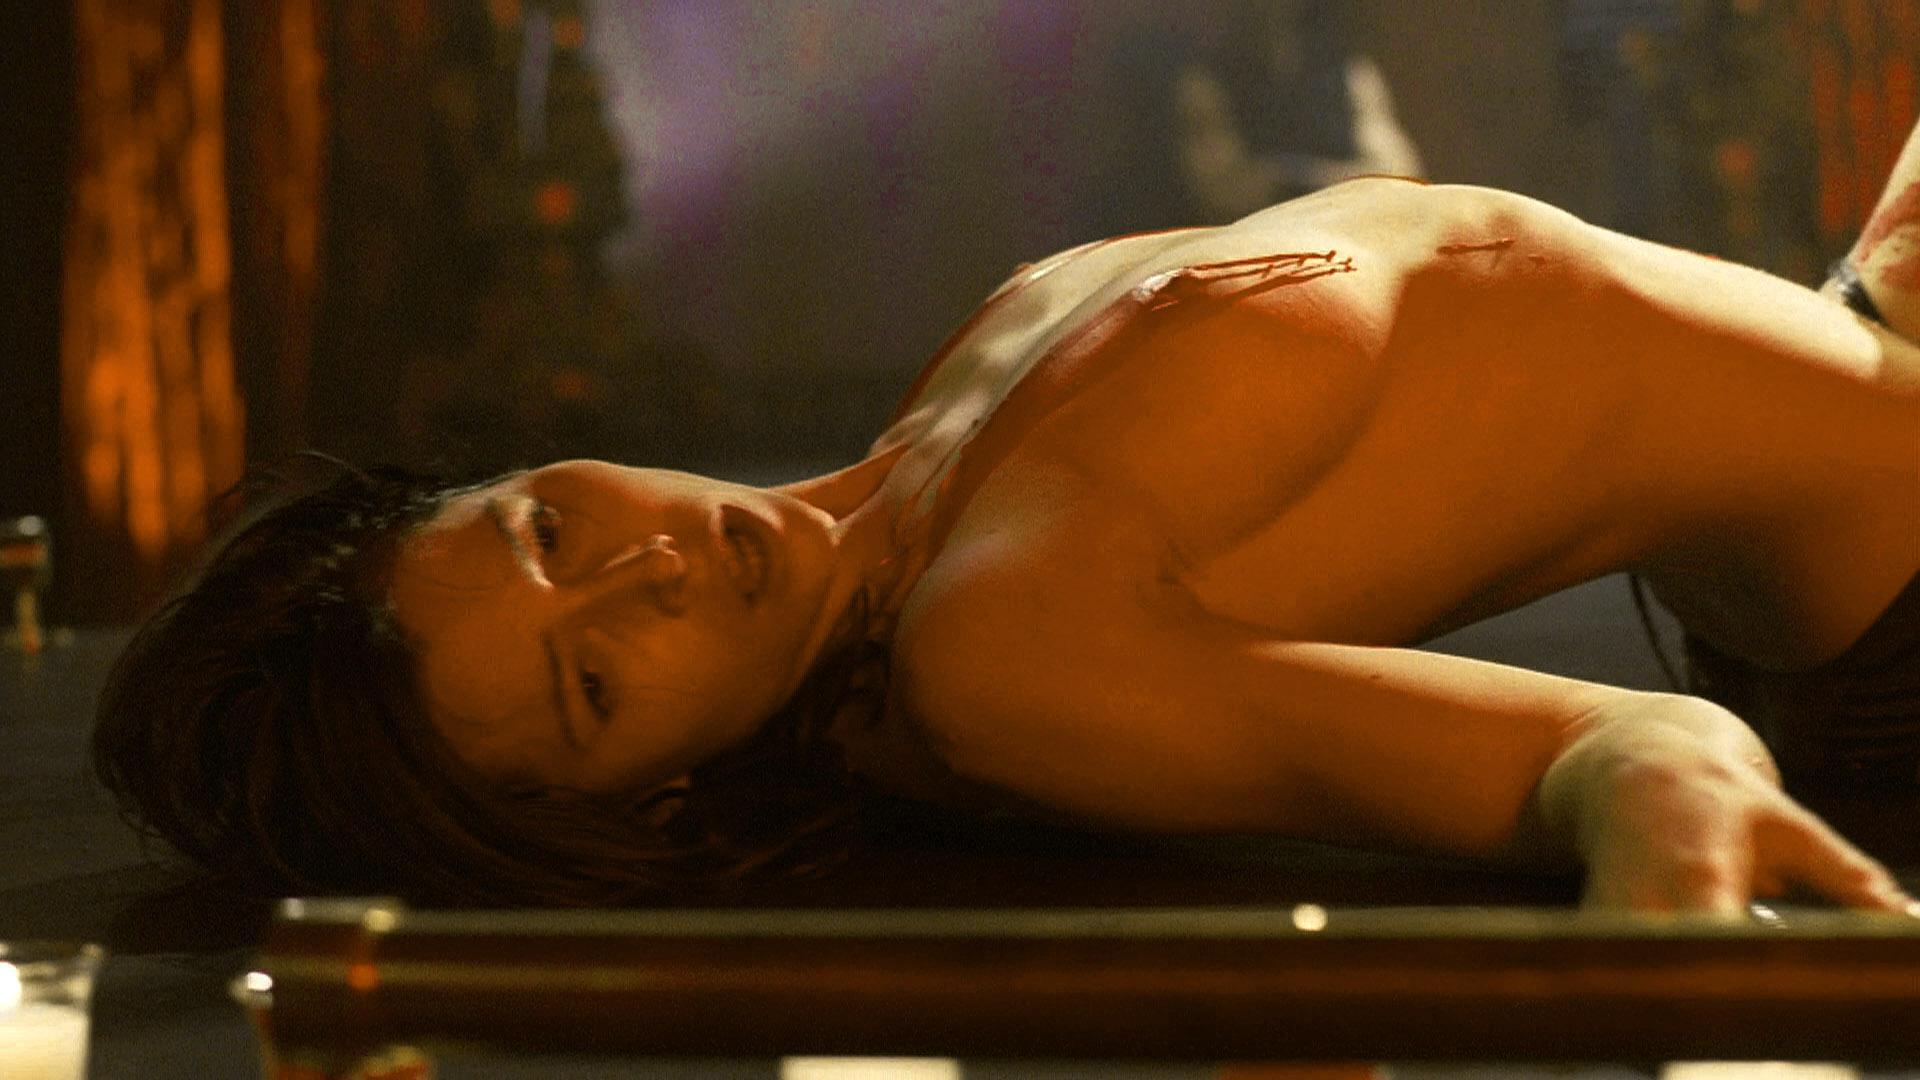 Jessica Biel: Free Porn Star Videos 76 xHamster